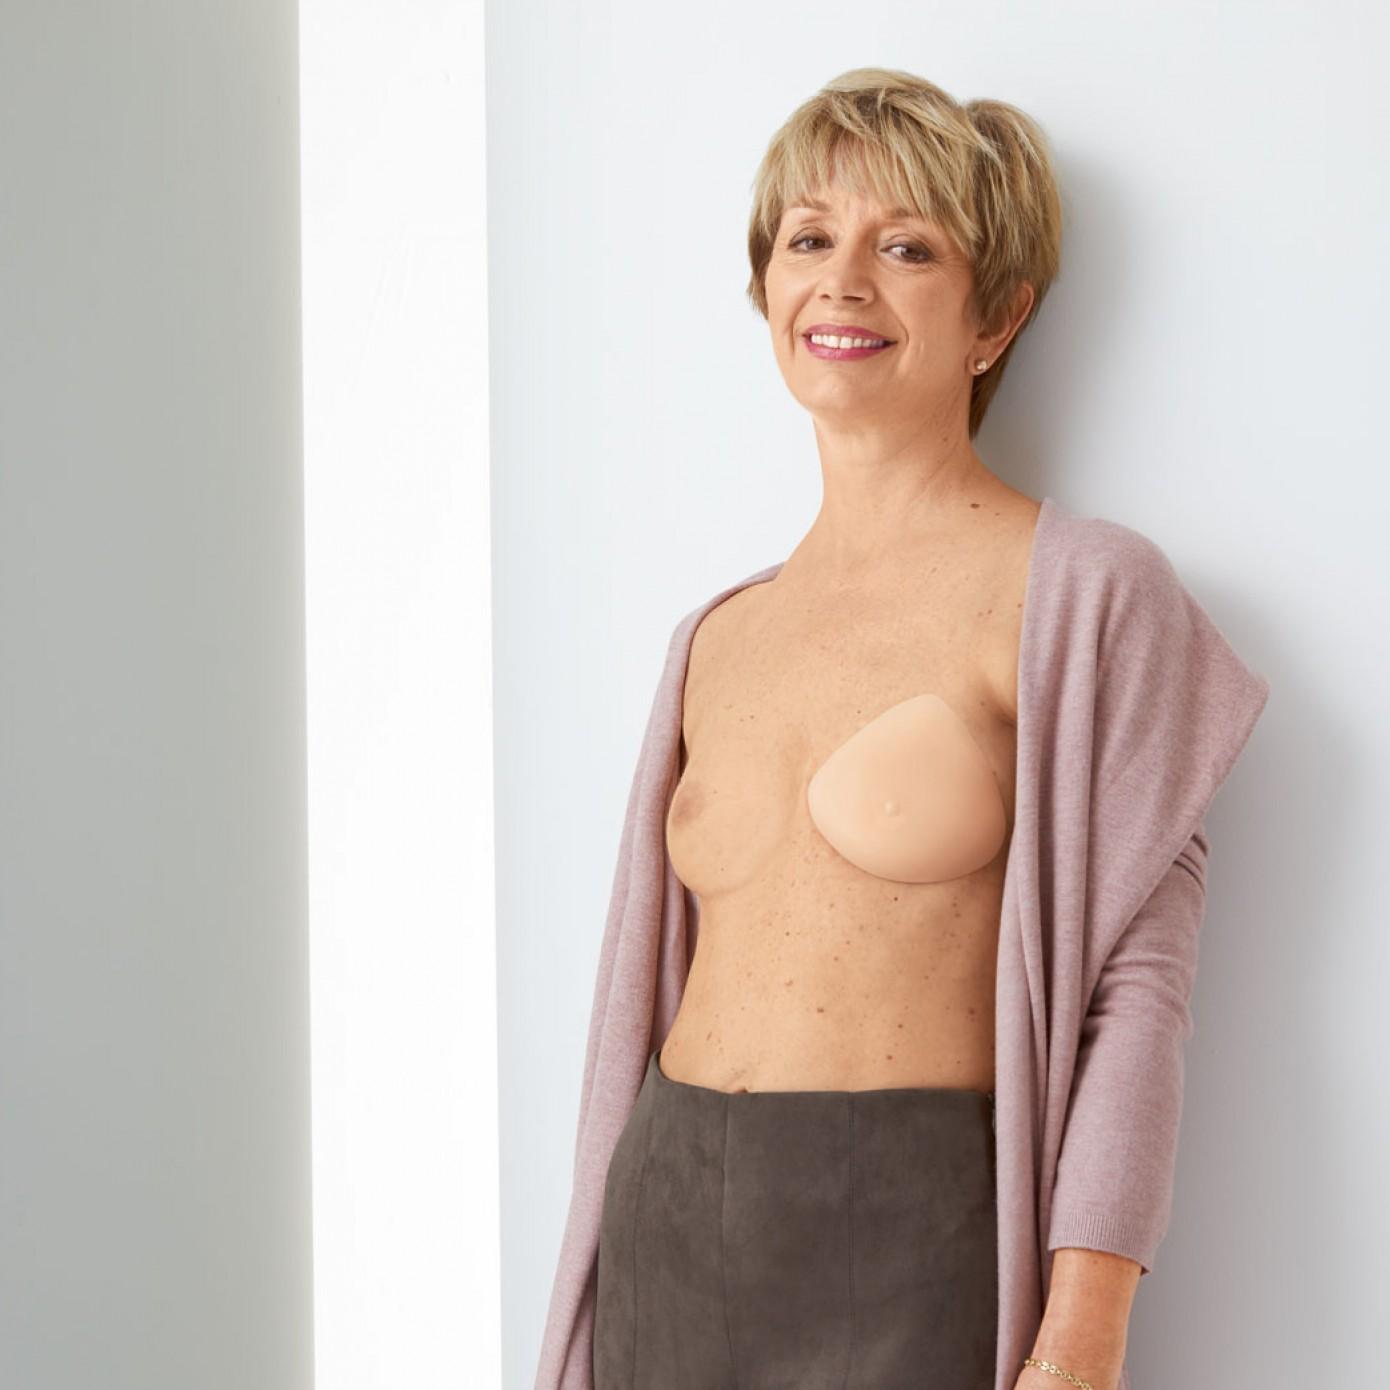 Contact_Brustprothese